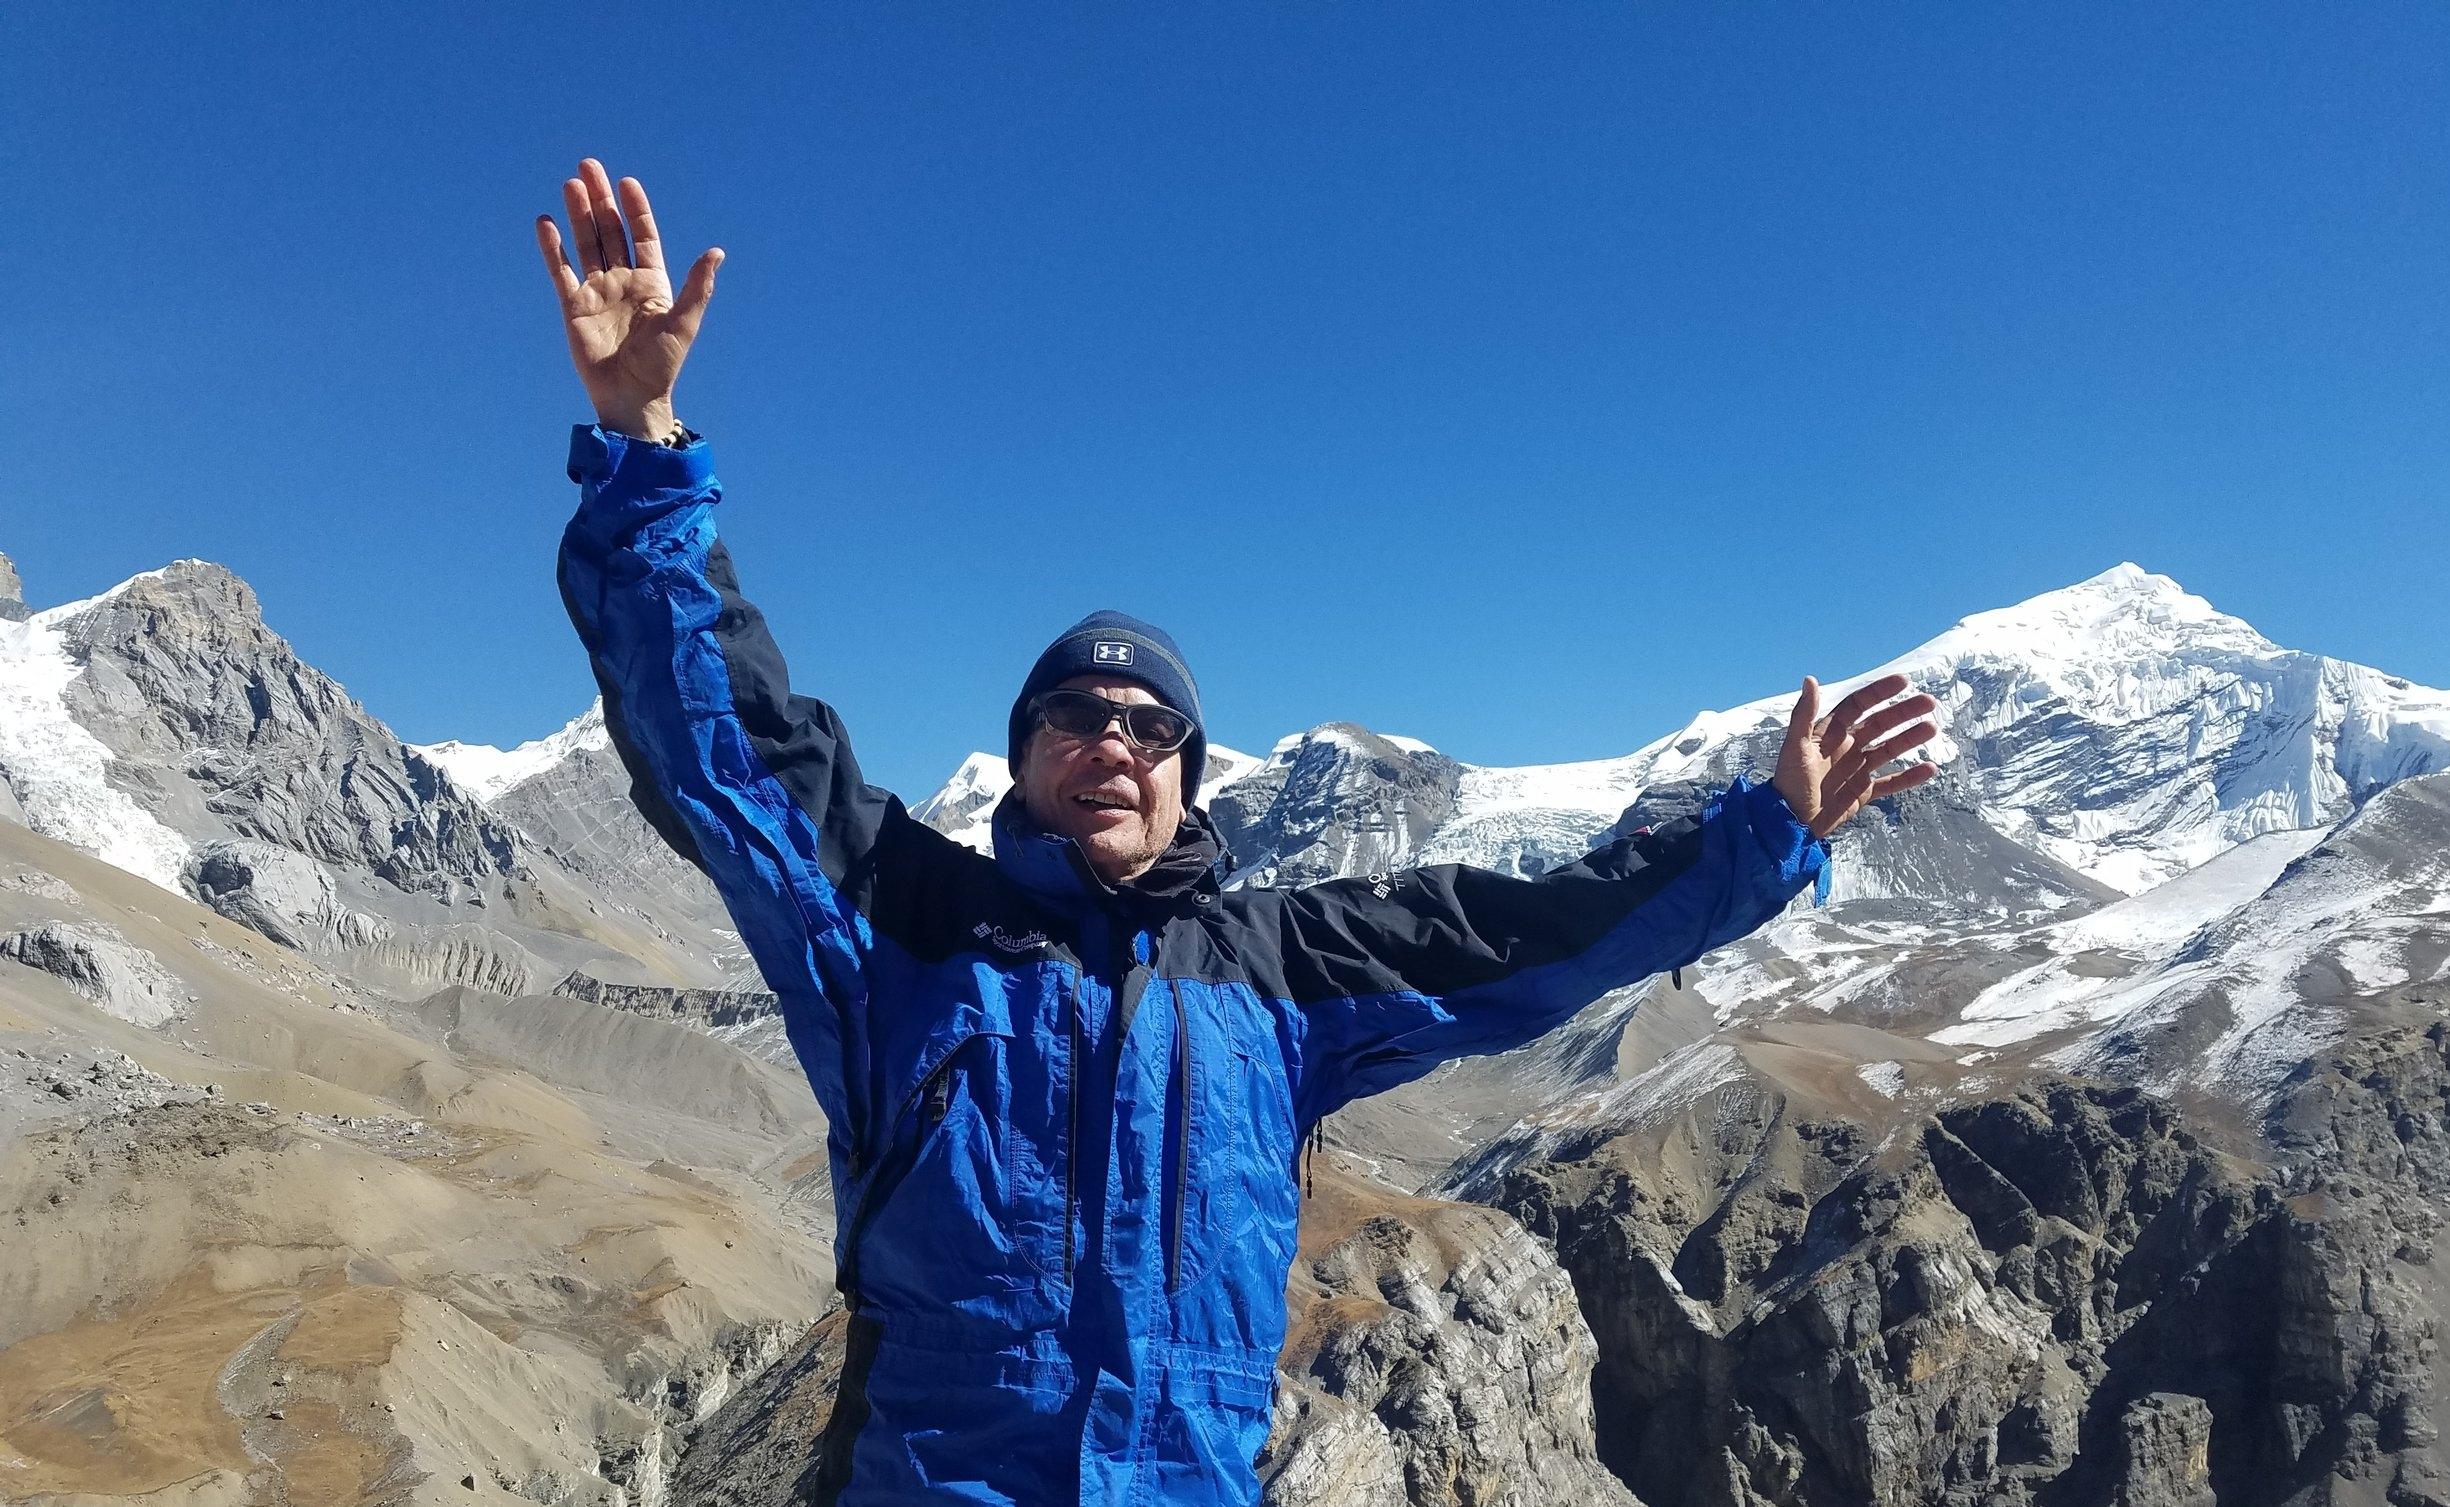 Throng PEdi high camp, Nepal (16000 ft)